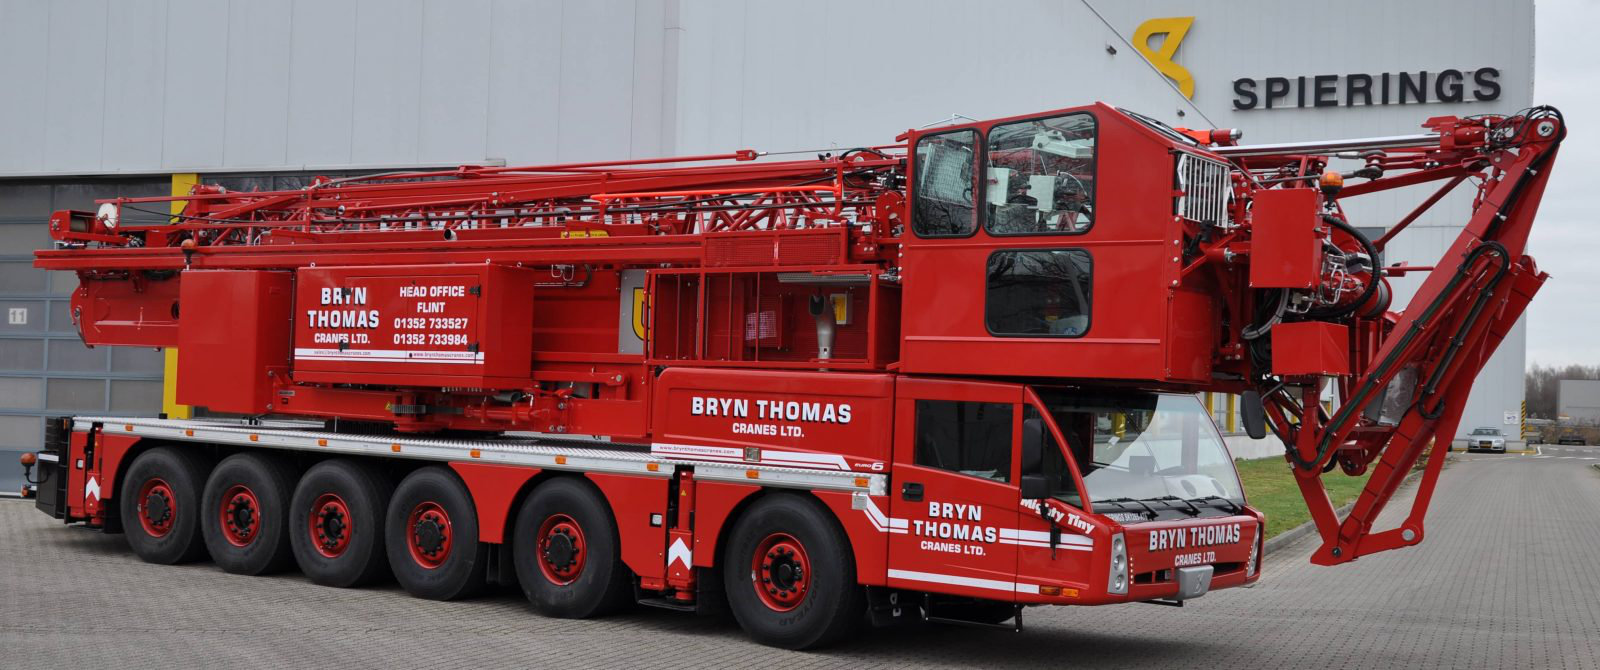 Spierings Mobile Crane at Bryn Thomas Cranes Ltd